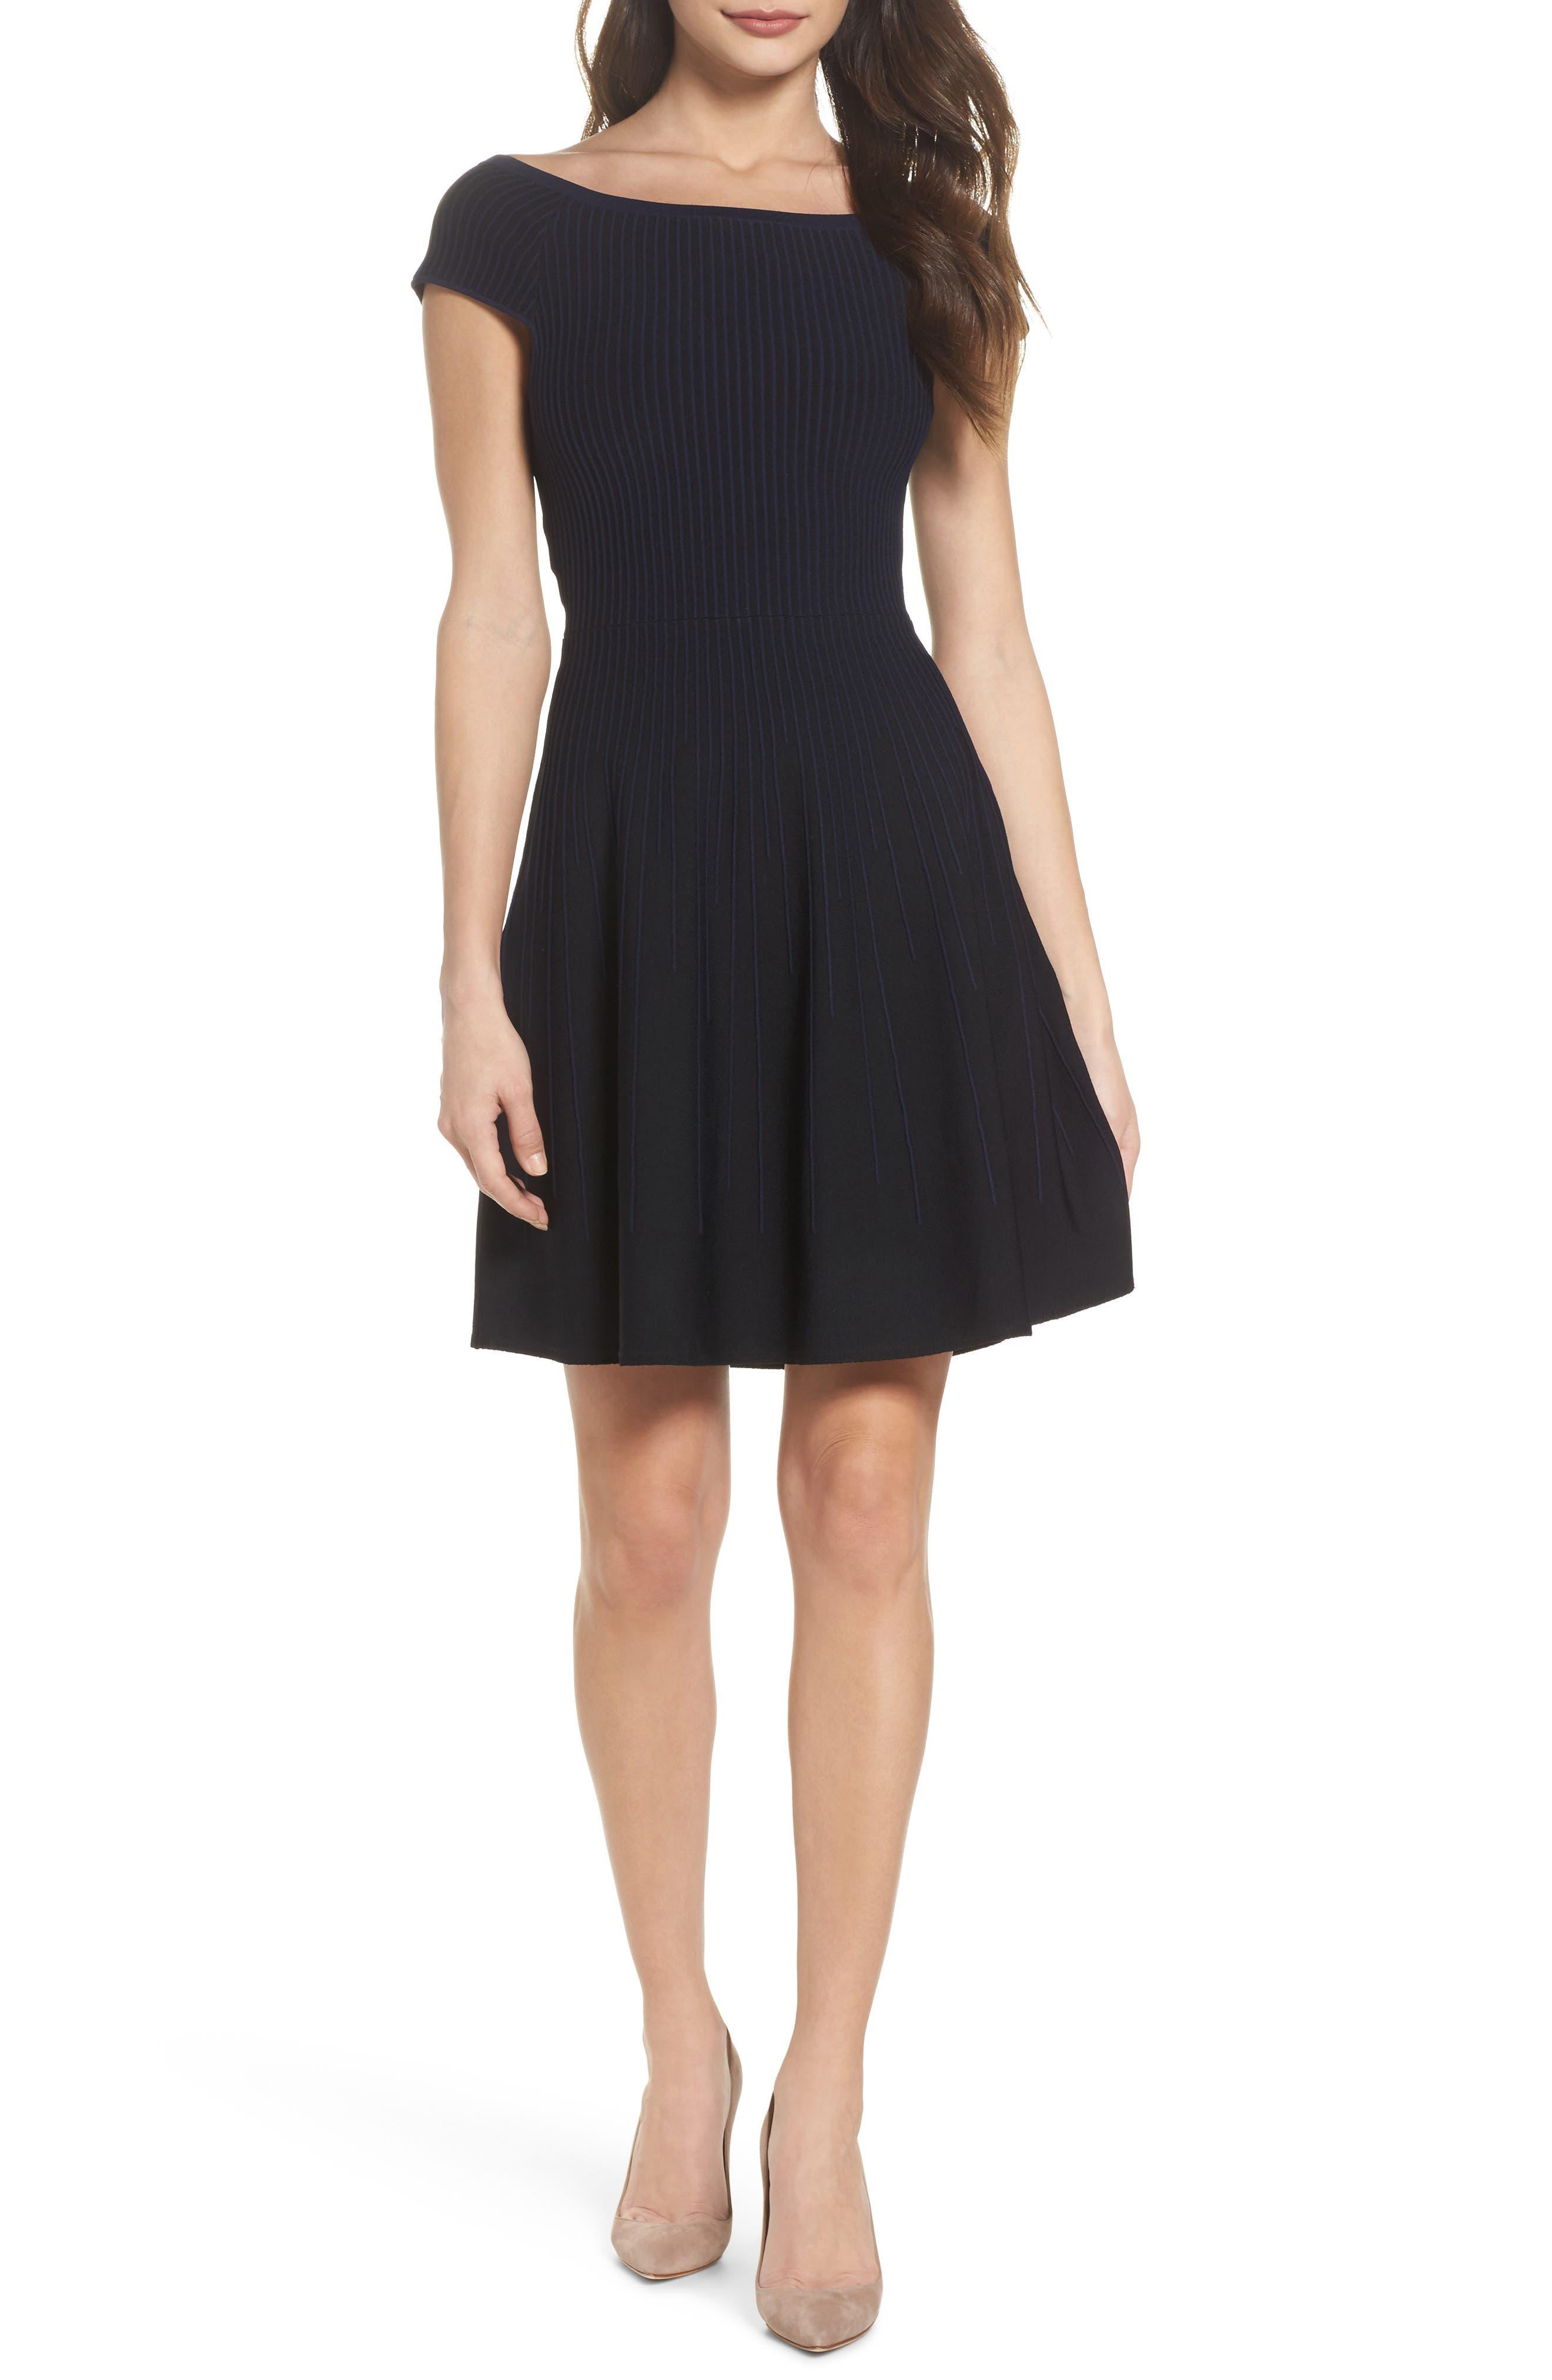 Olivia Off the Shoulder Dress,                             Main thumbnail 1, color,                             Black/ Nocturnal